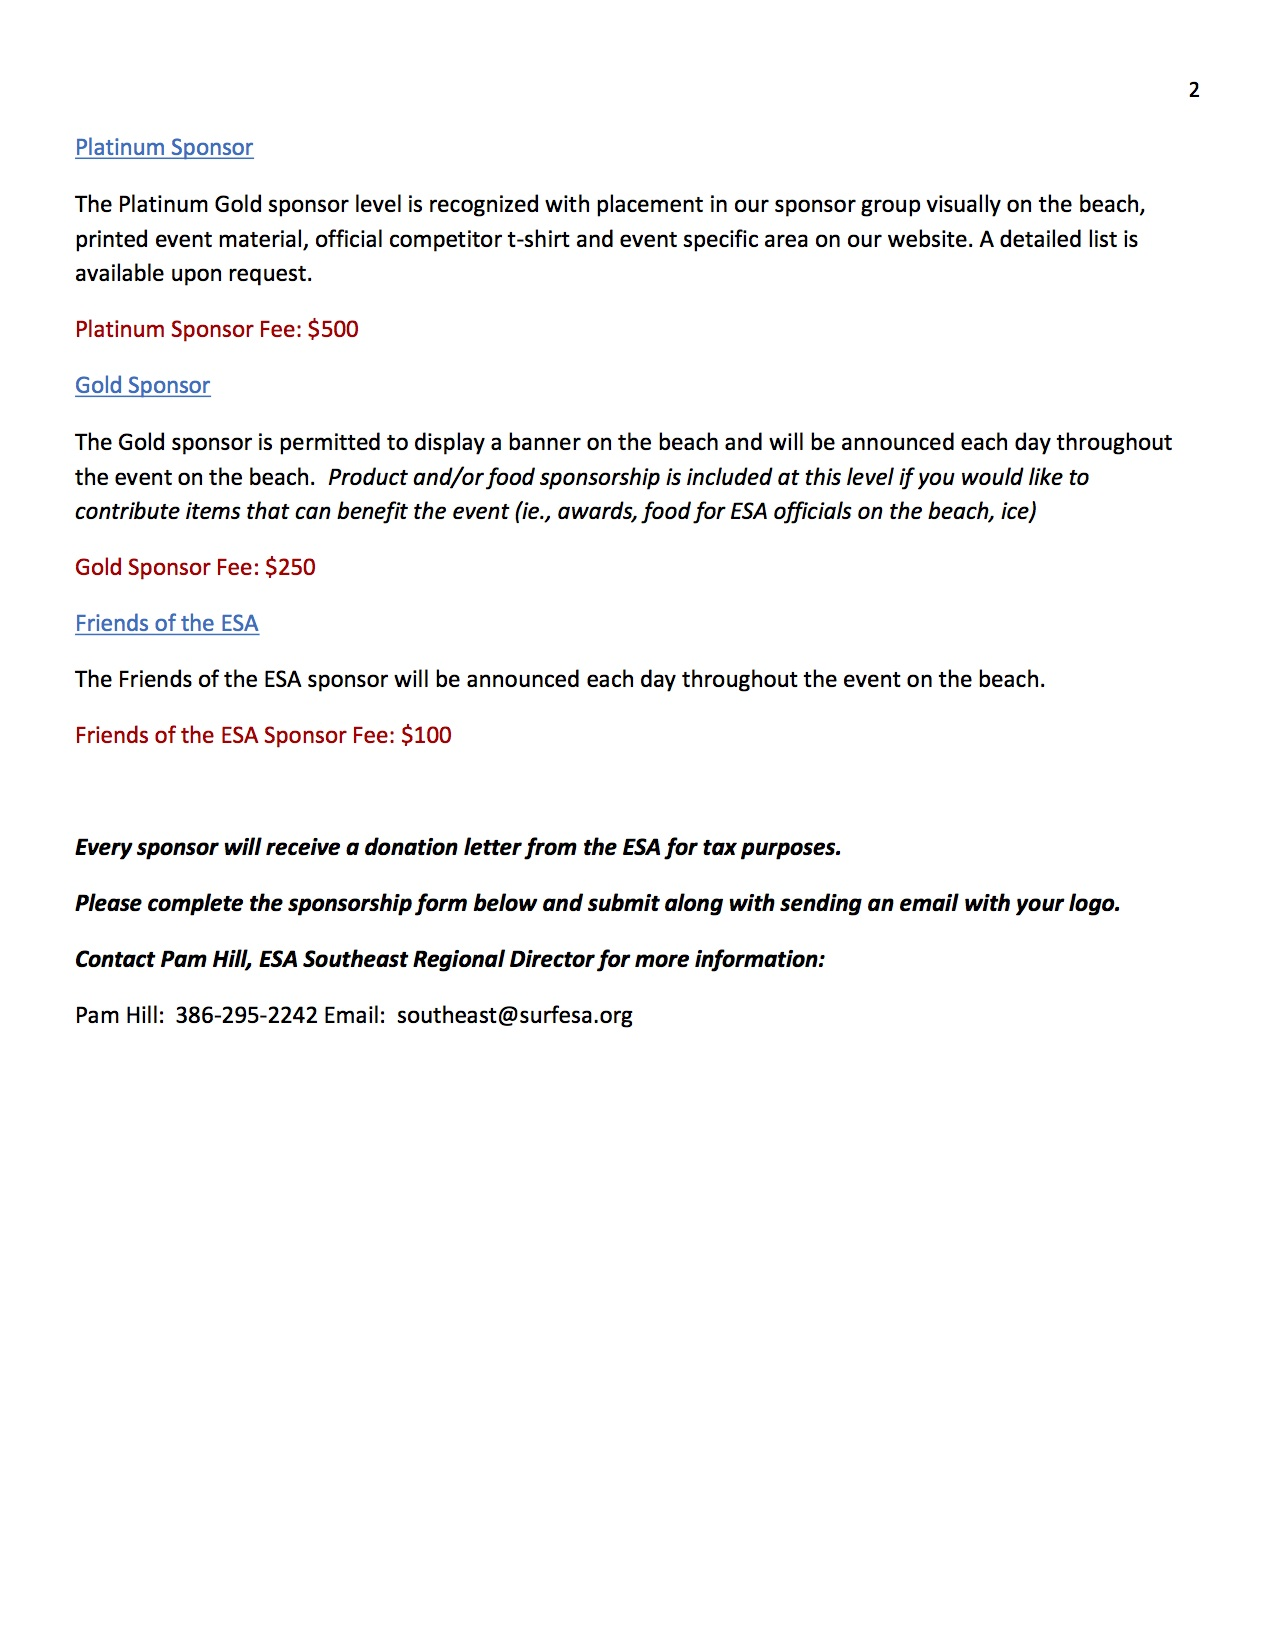 2014 SE Sponsorship letter p2